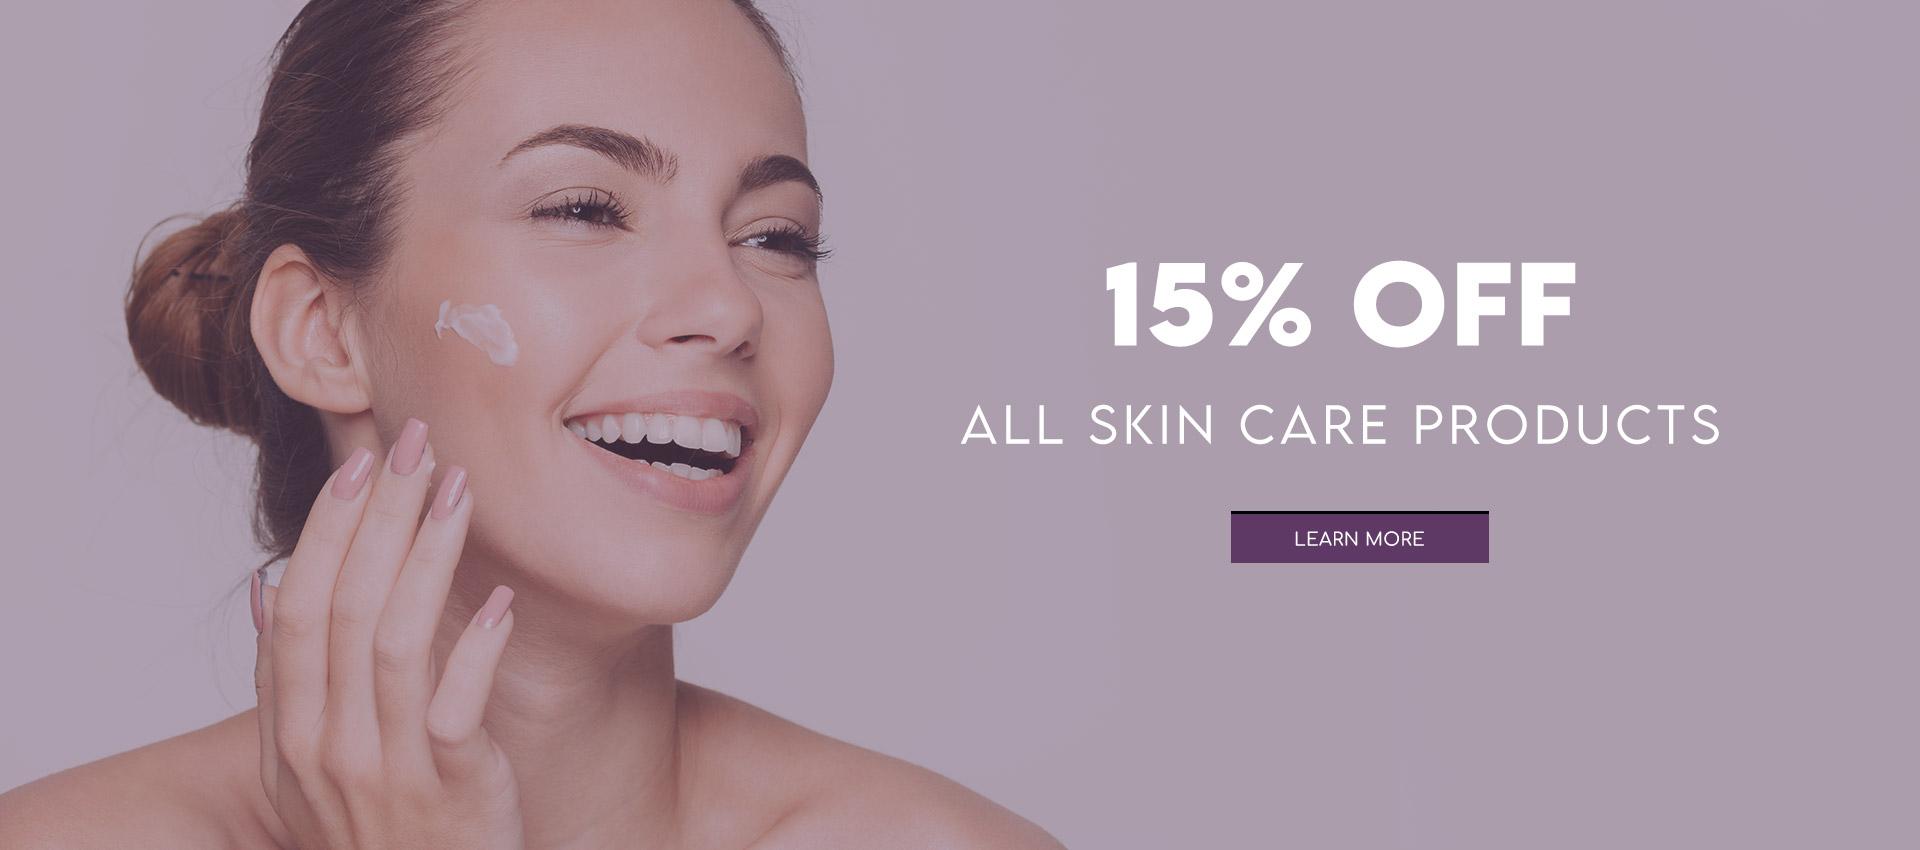 Slider-Skin-Care